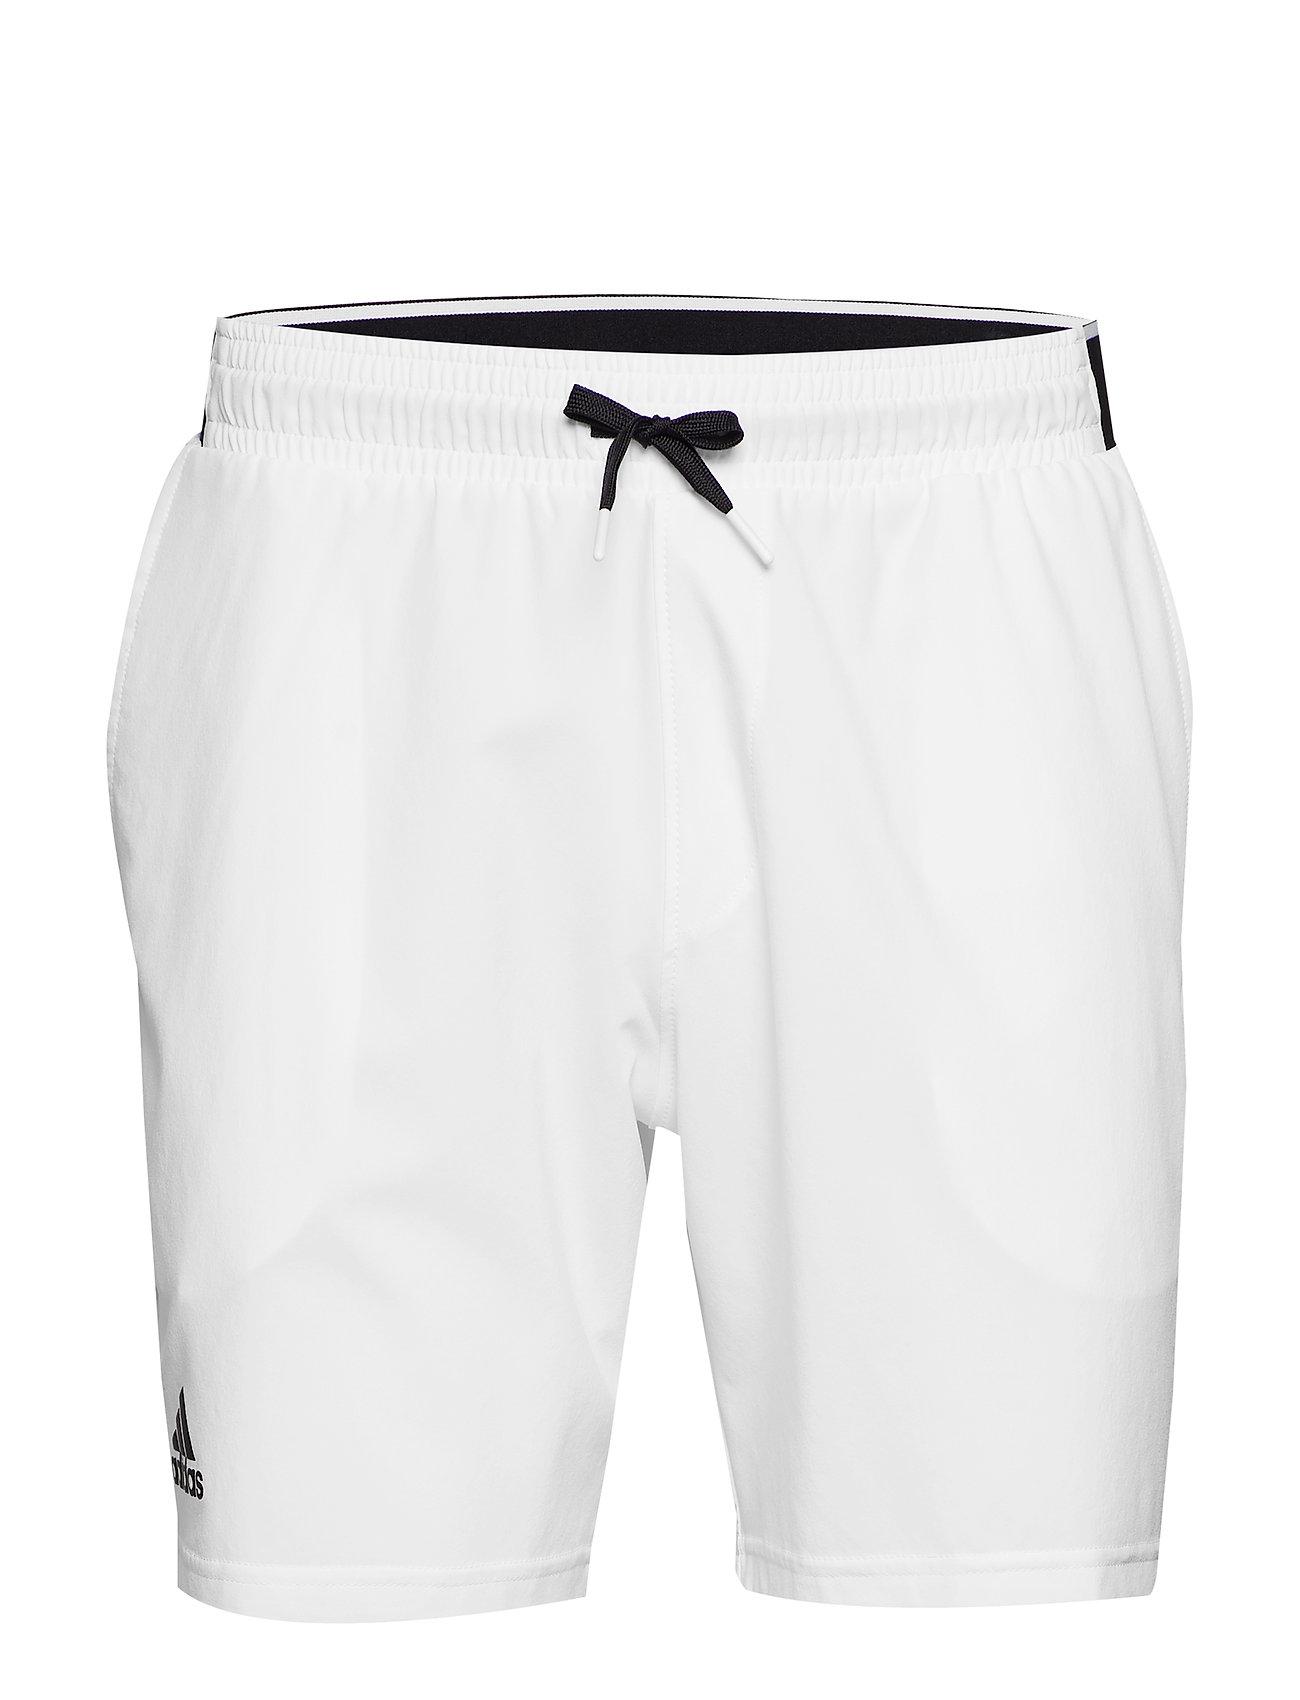 adidas Tennis CLUB SW SHORT 7 M - WHITE